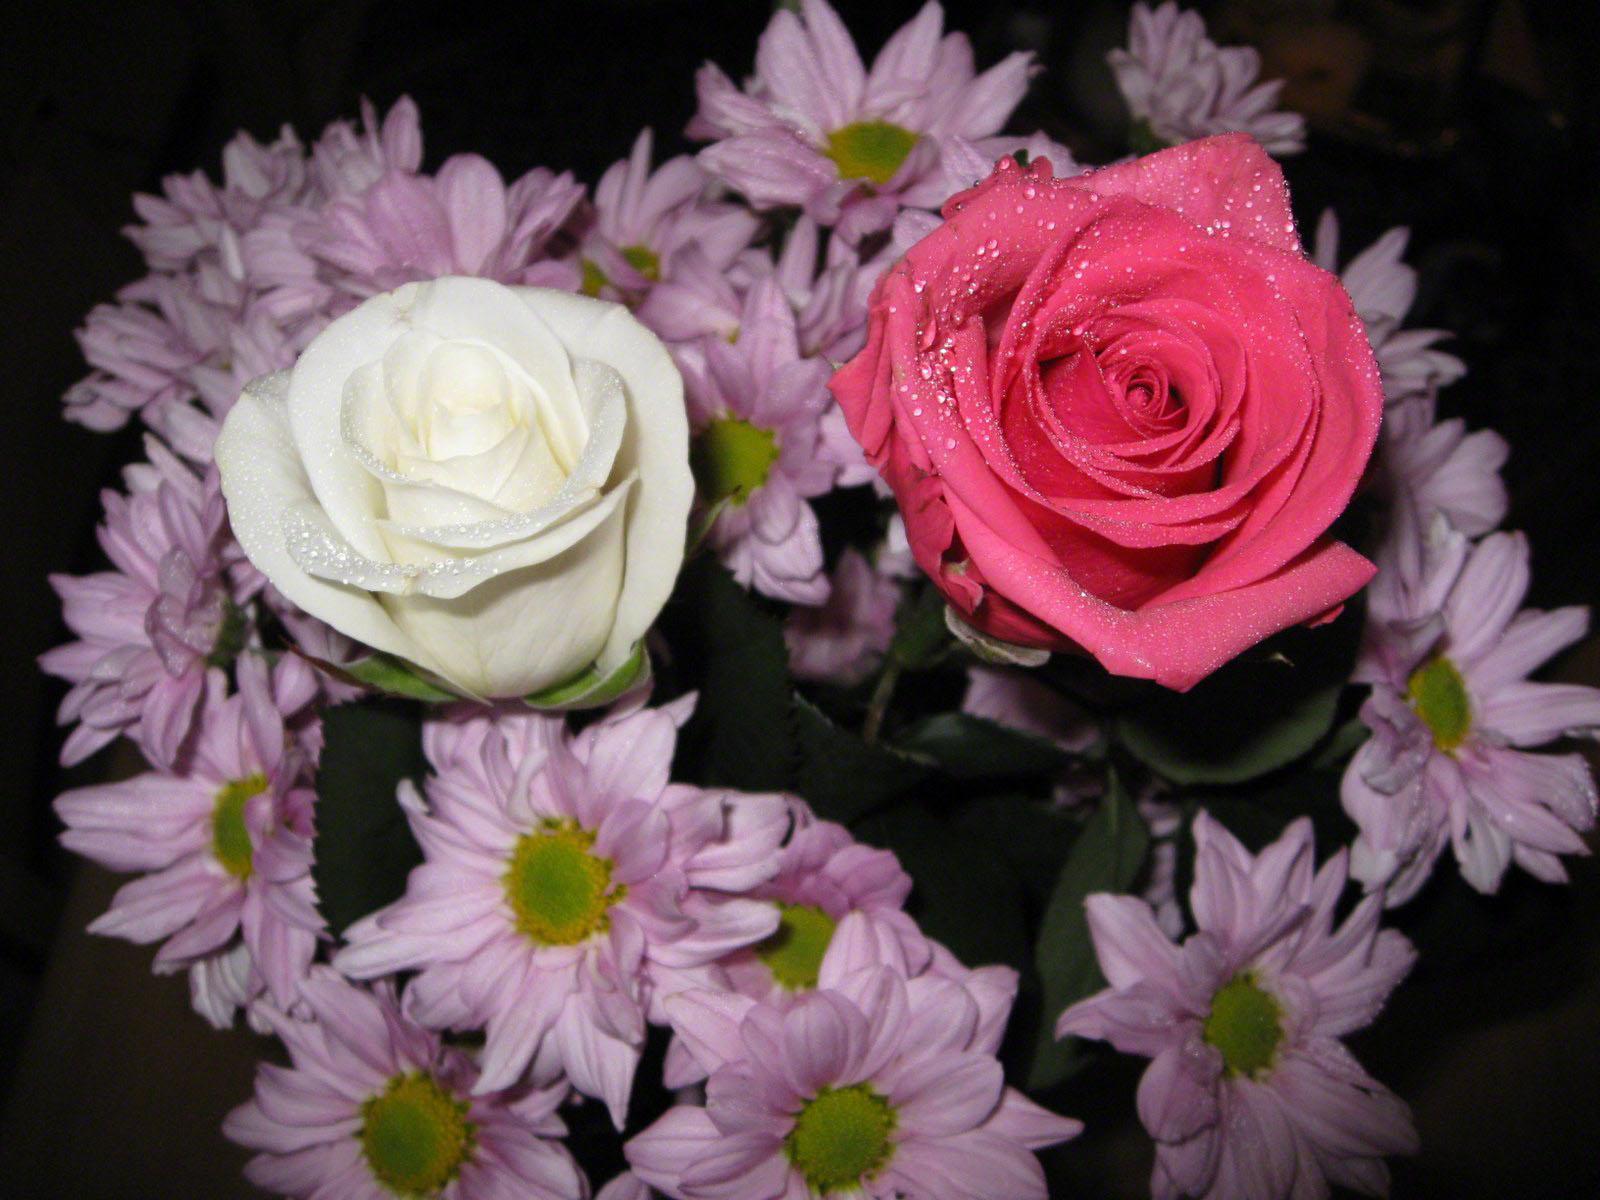 http://www.fabiovisentin.com/photography/photo/12/roses-wallpaper-roses-bouquets4444.JPG